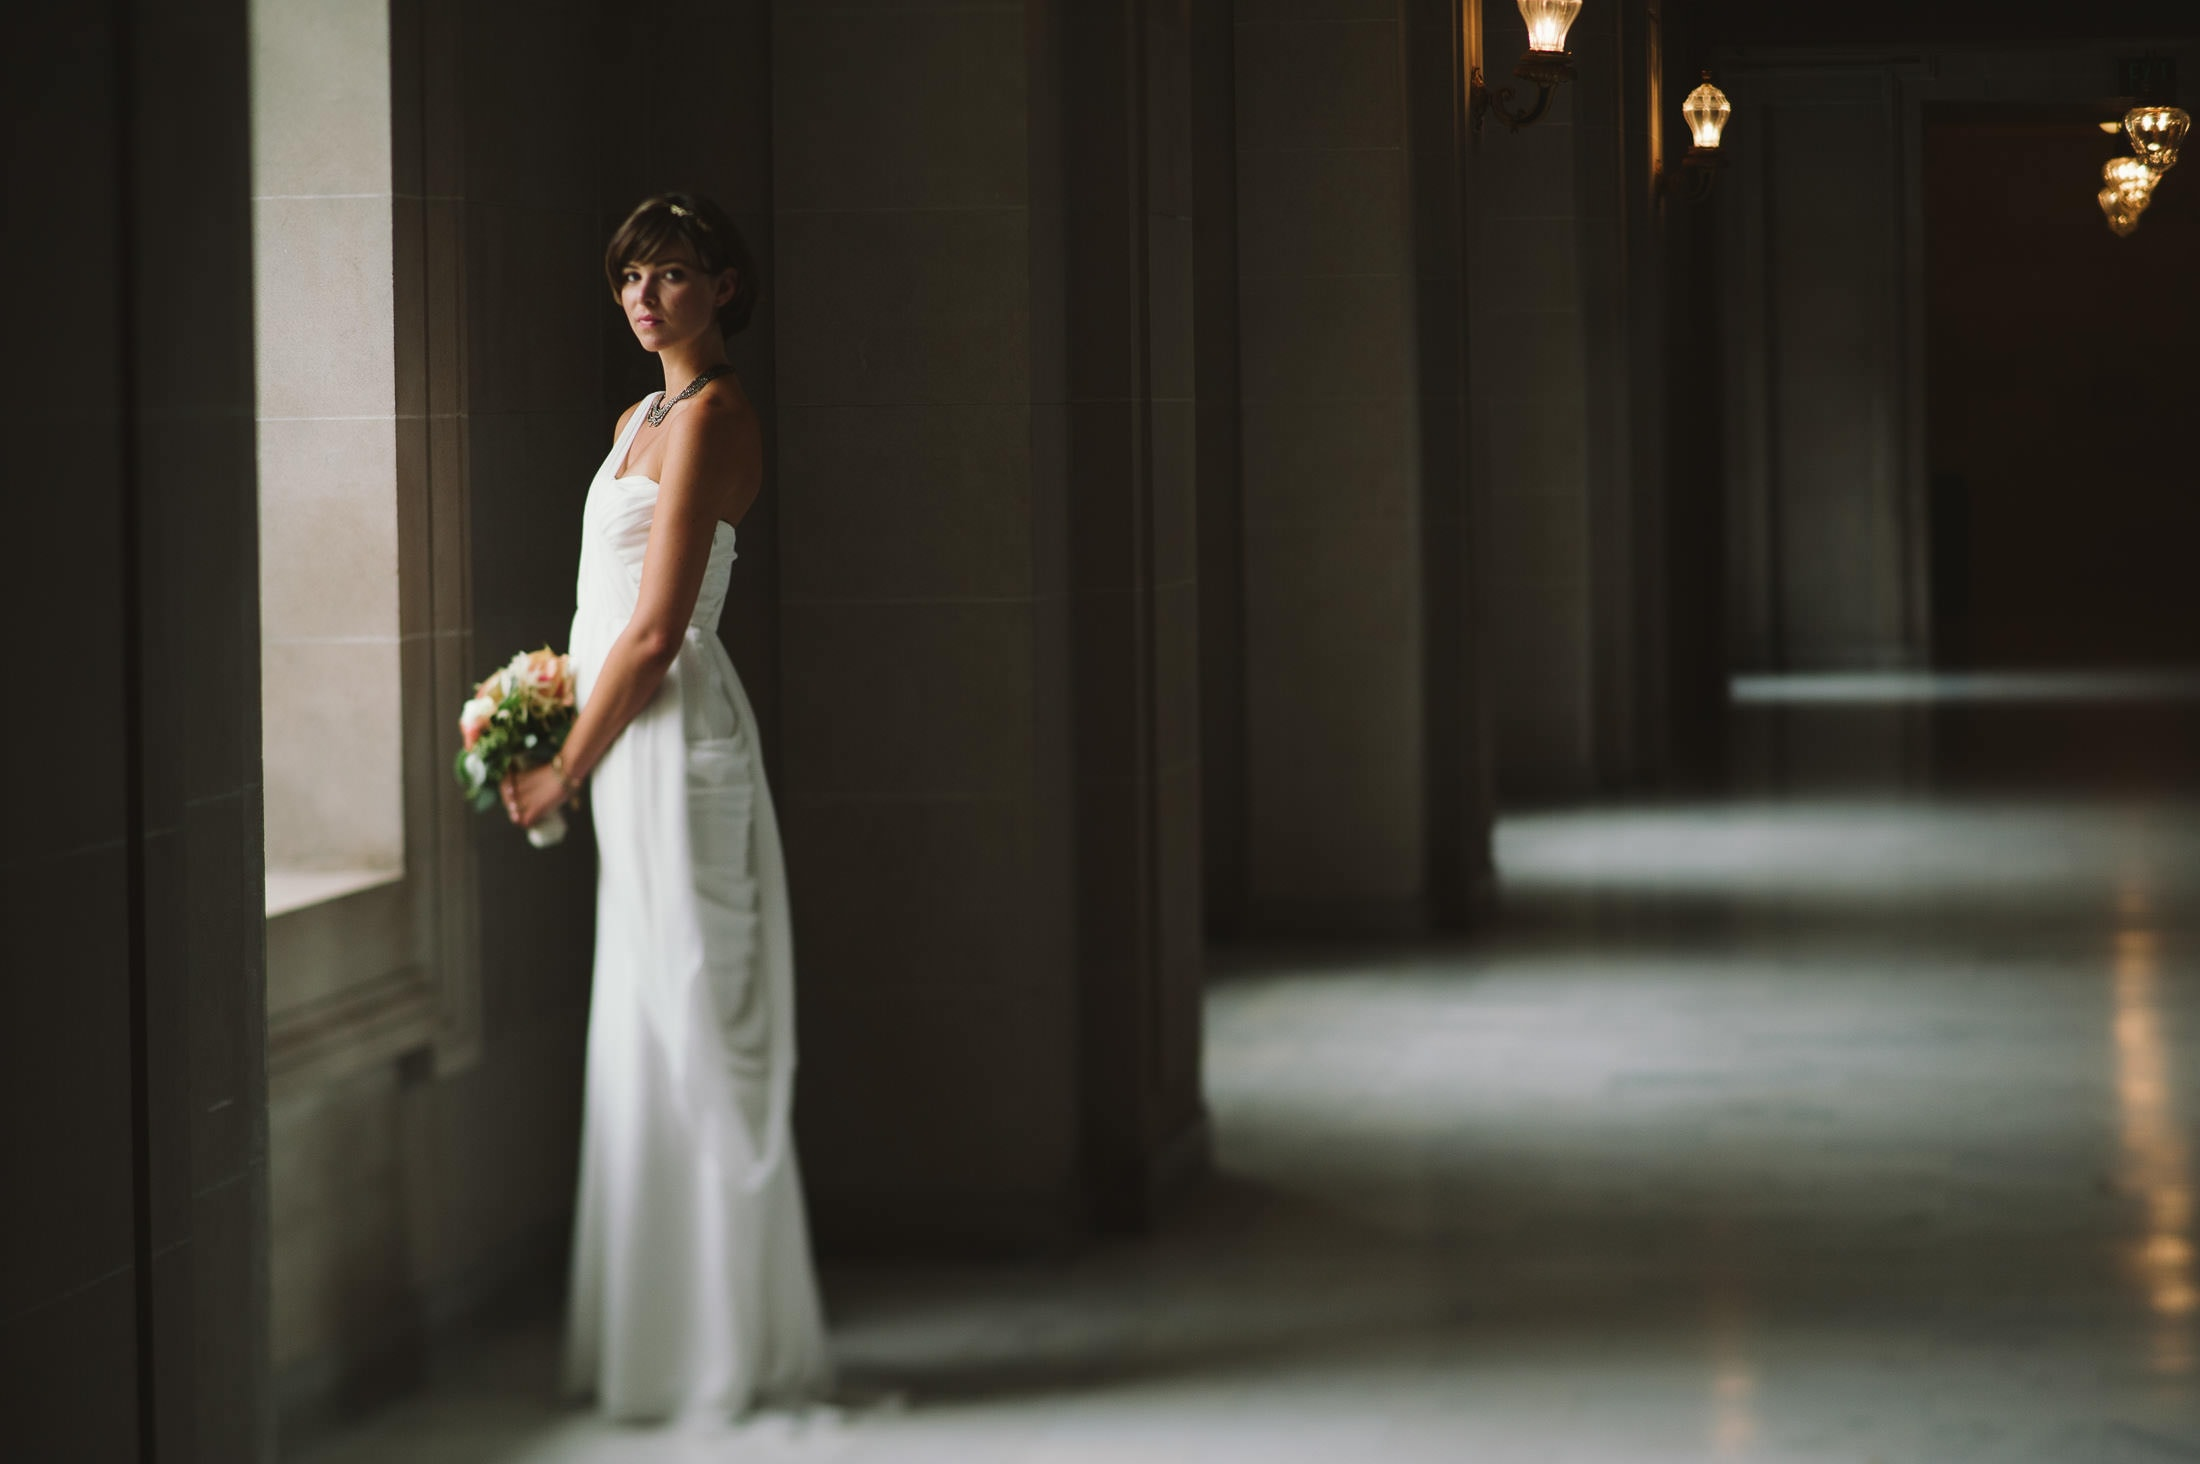 Bridal Portrait at San Francisco City Hall Wedding